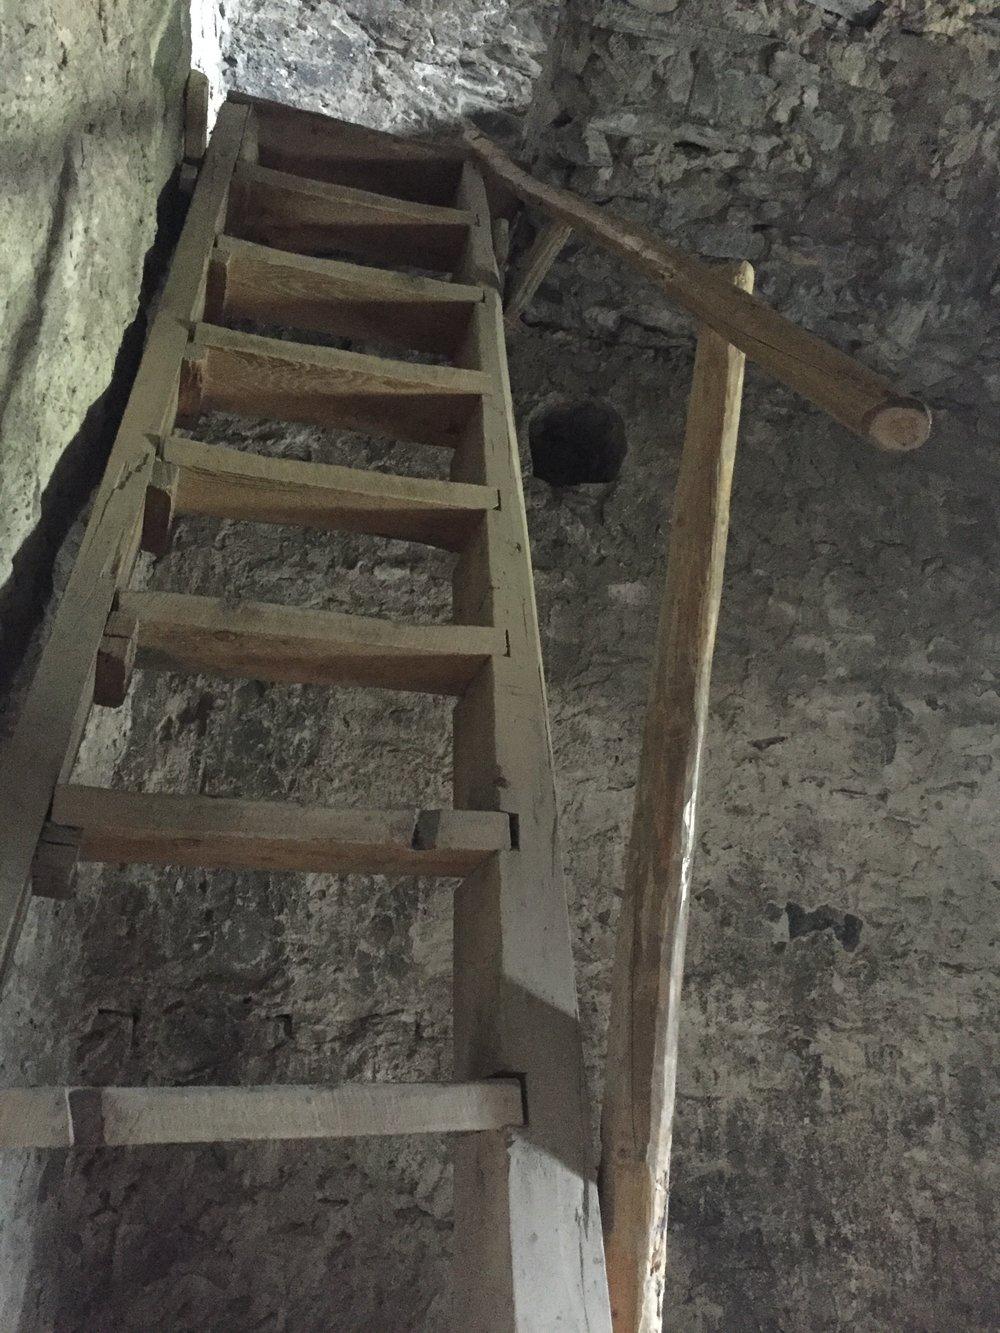 Ladder inside the Svan tower